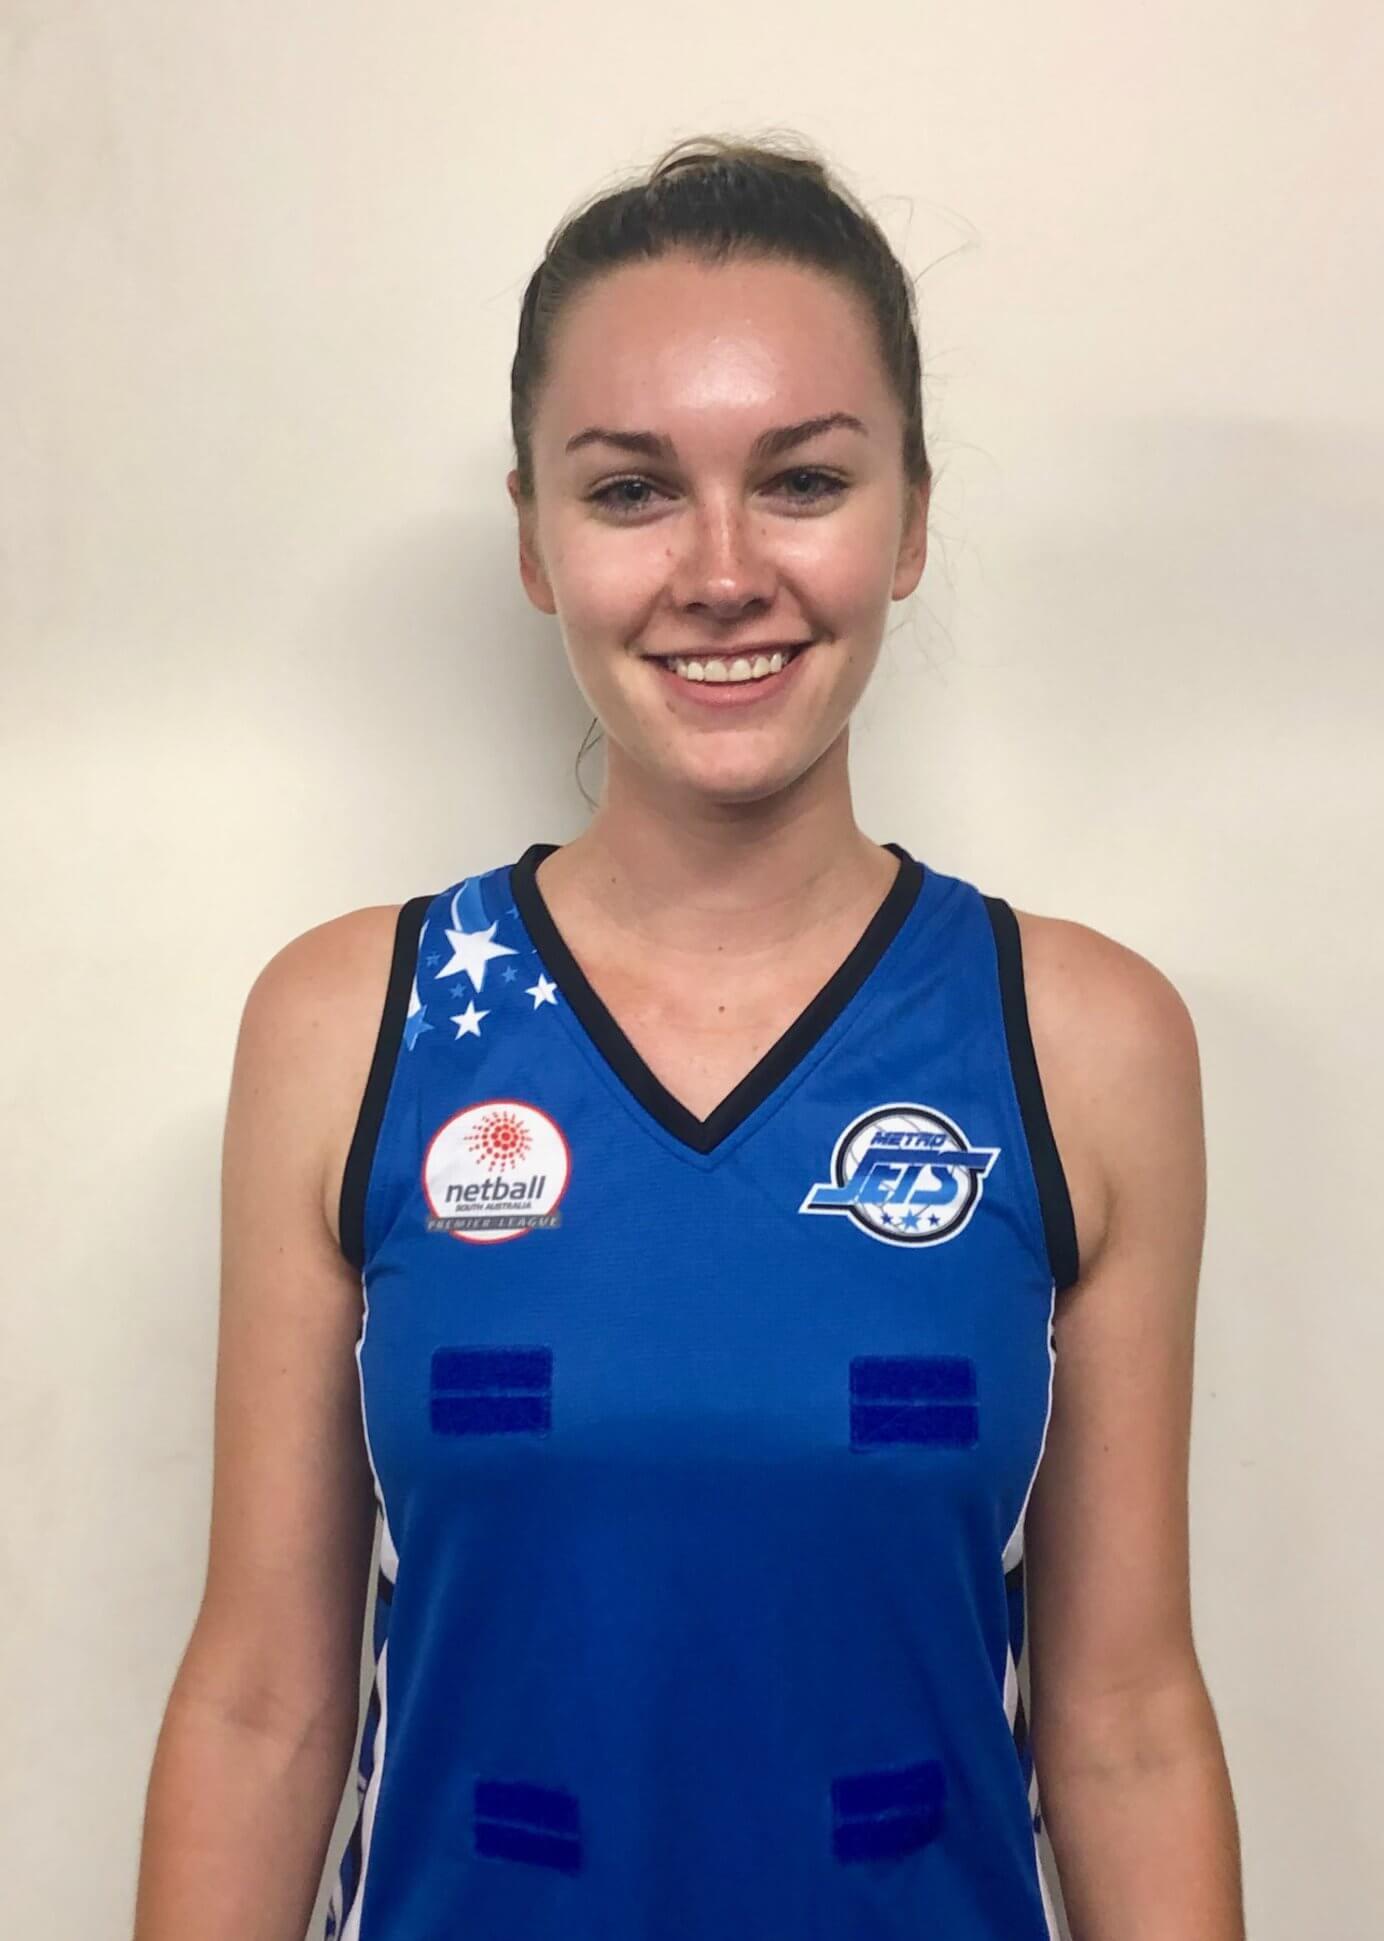 Bridget Kuerschner